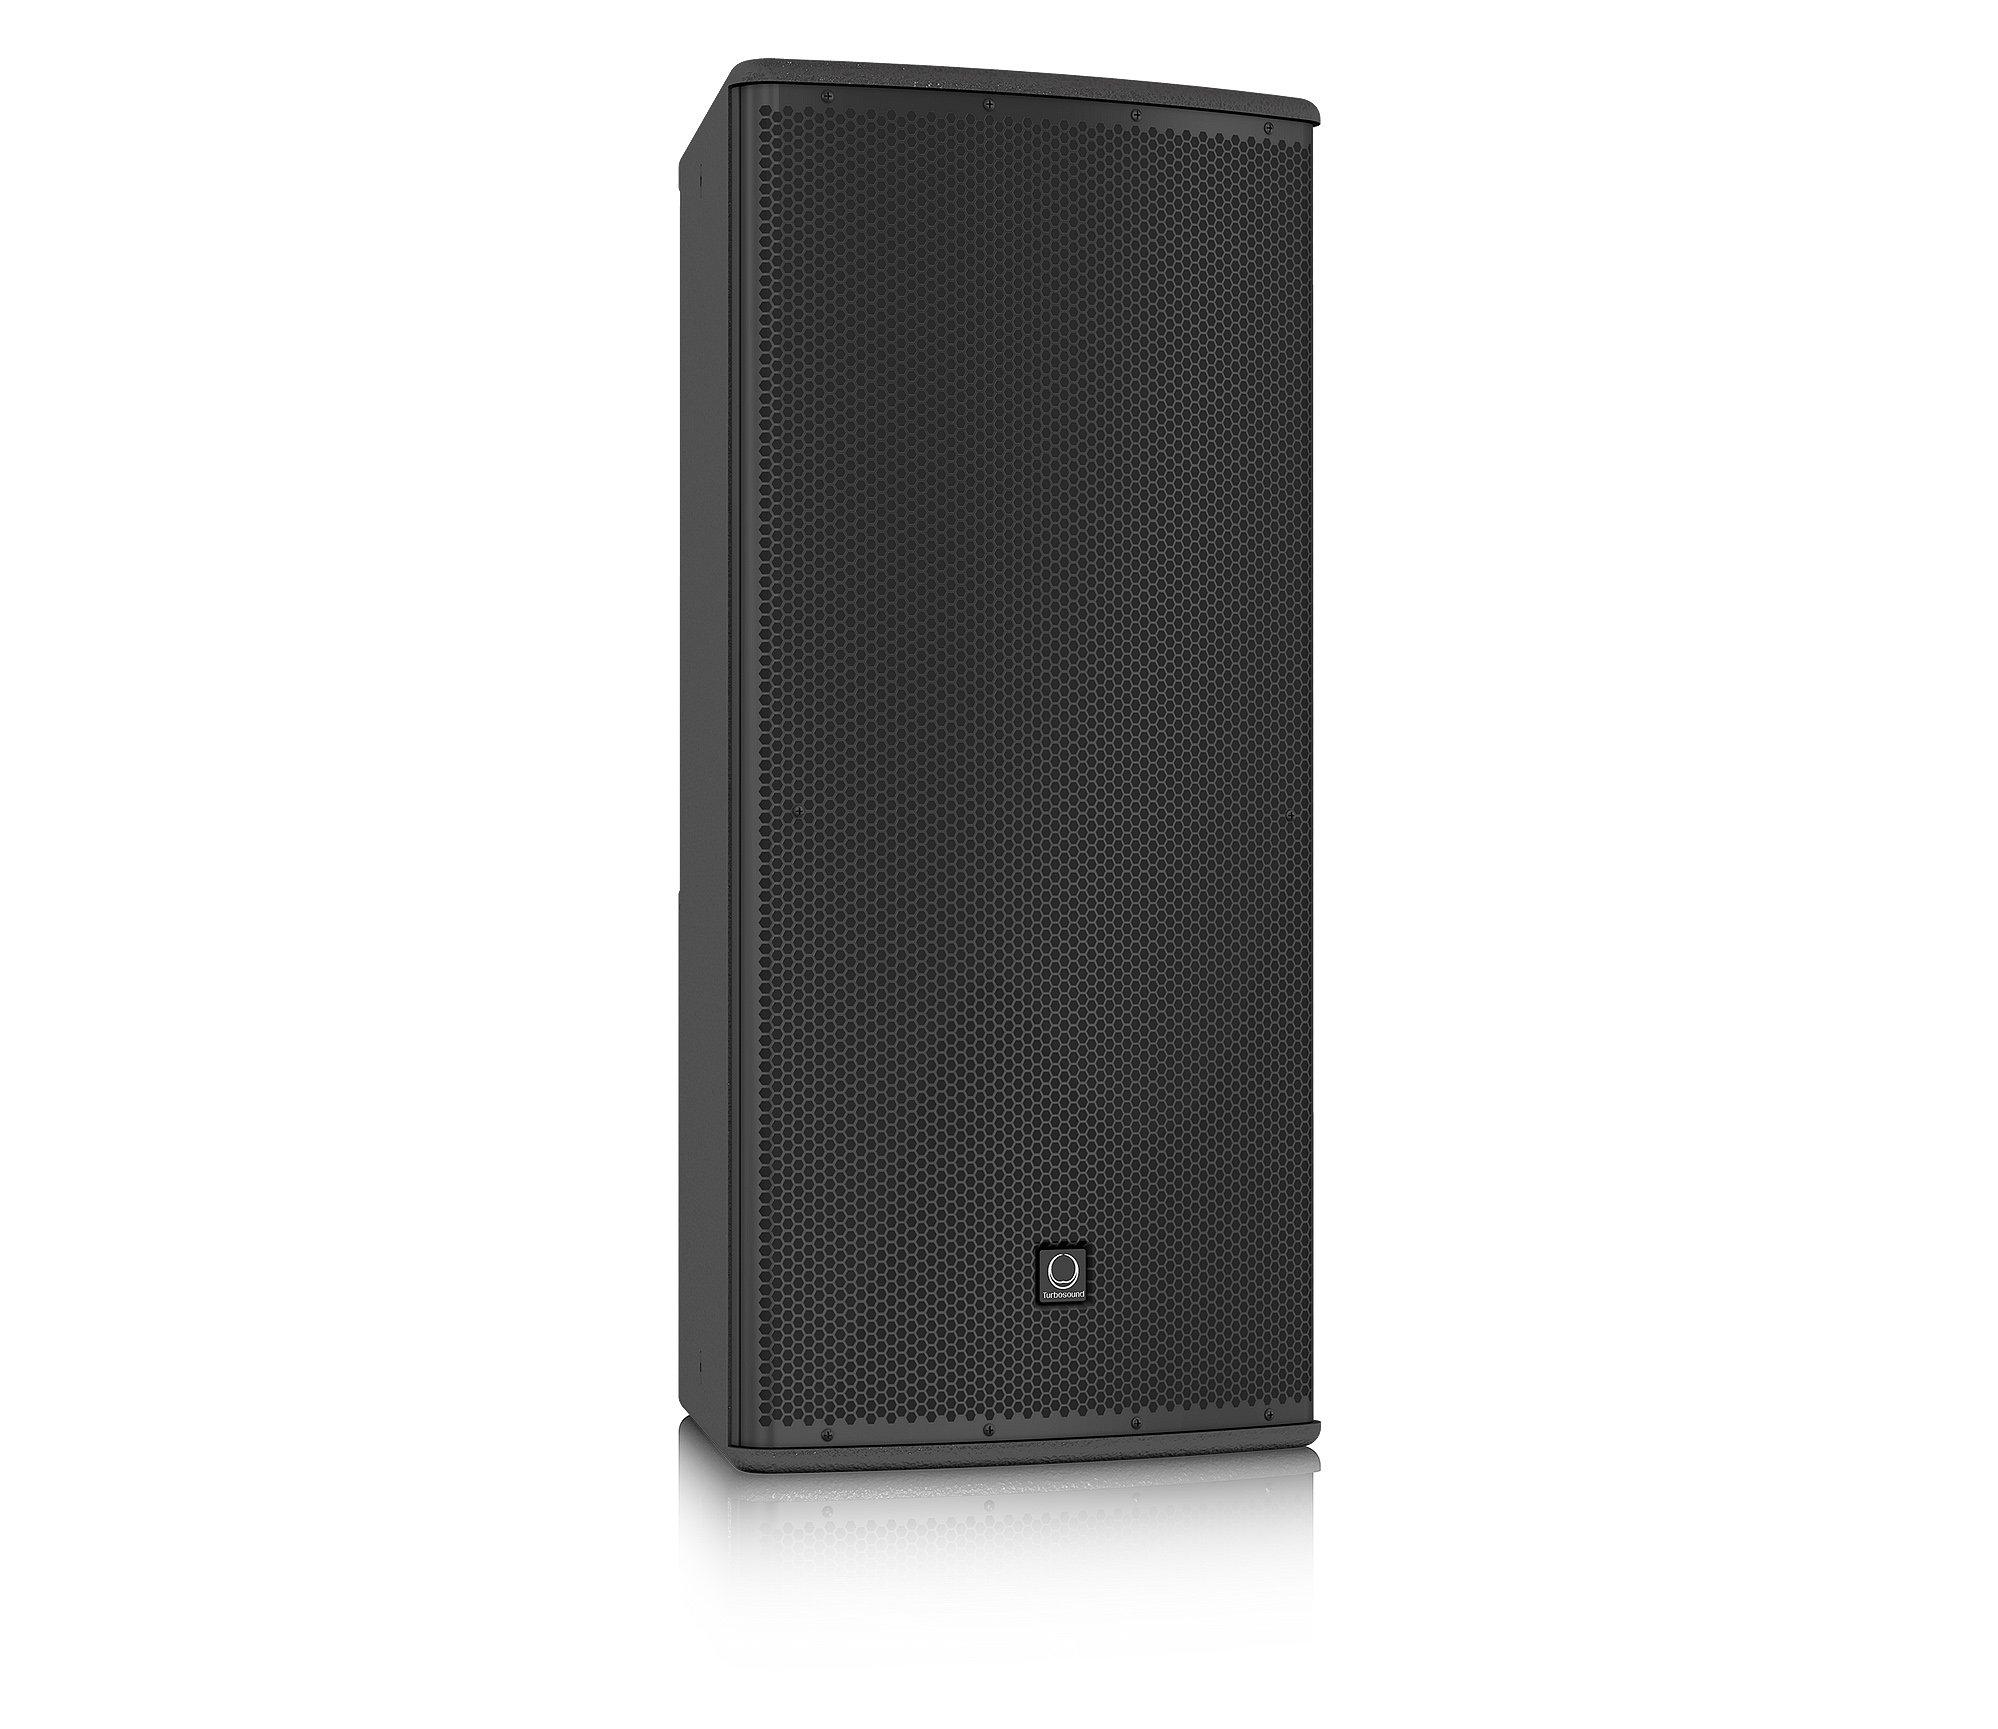 "12"" 600W (8 Ohms) Weather Resistant 2-Way Full-Range Passive/Bi-Amp Loudspeaker with 60°x40° Dispersion in Black"